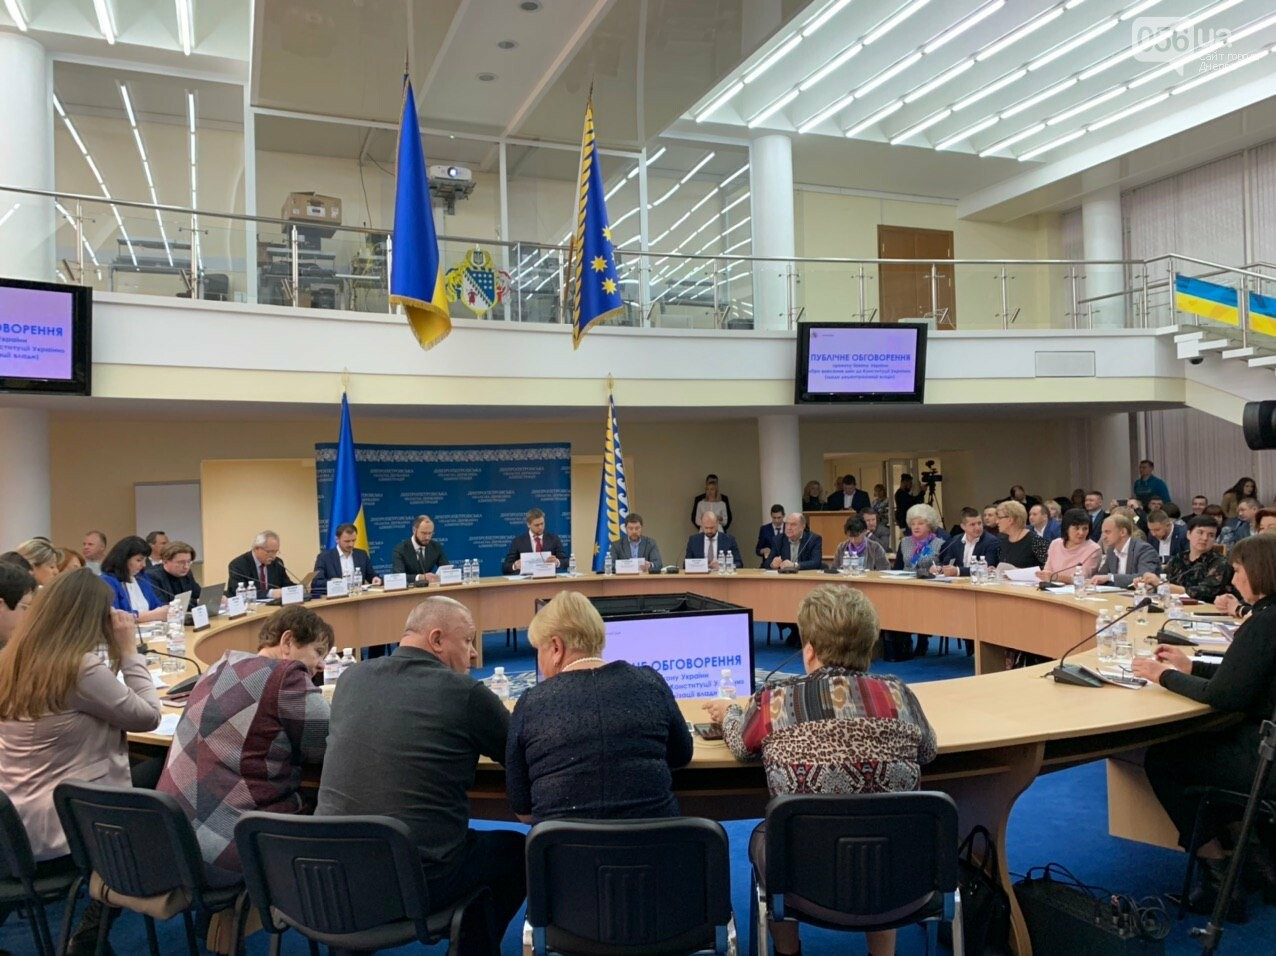 В Днепре представители трех областей обсуждают реформу децентрализации, - ФОТО, ВИДЕО, фото-1